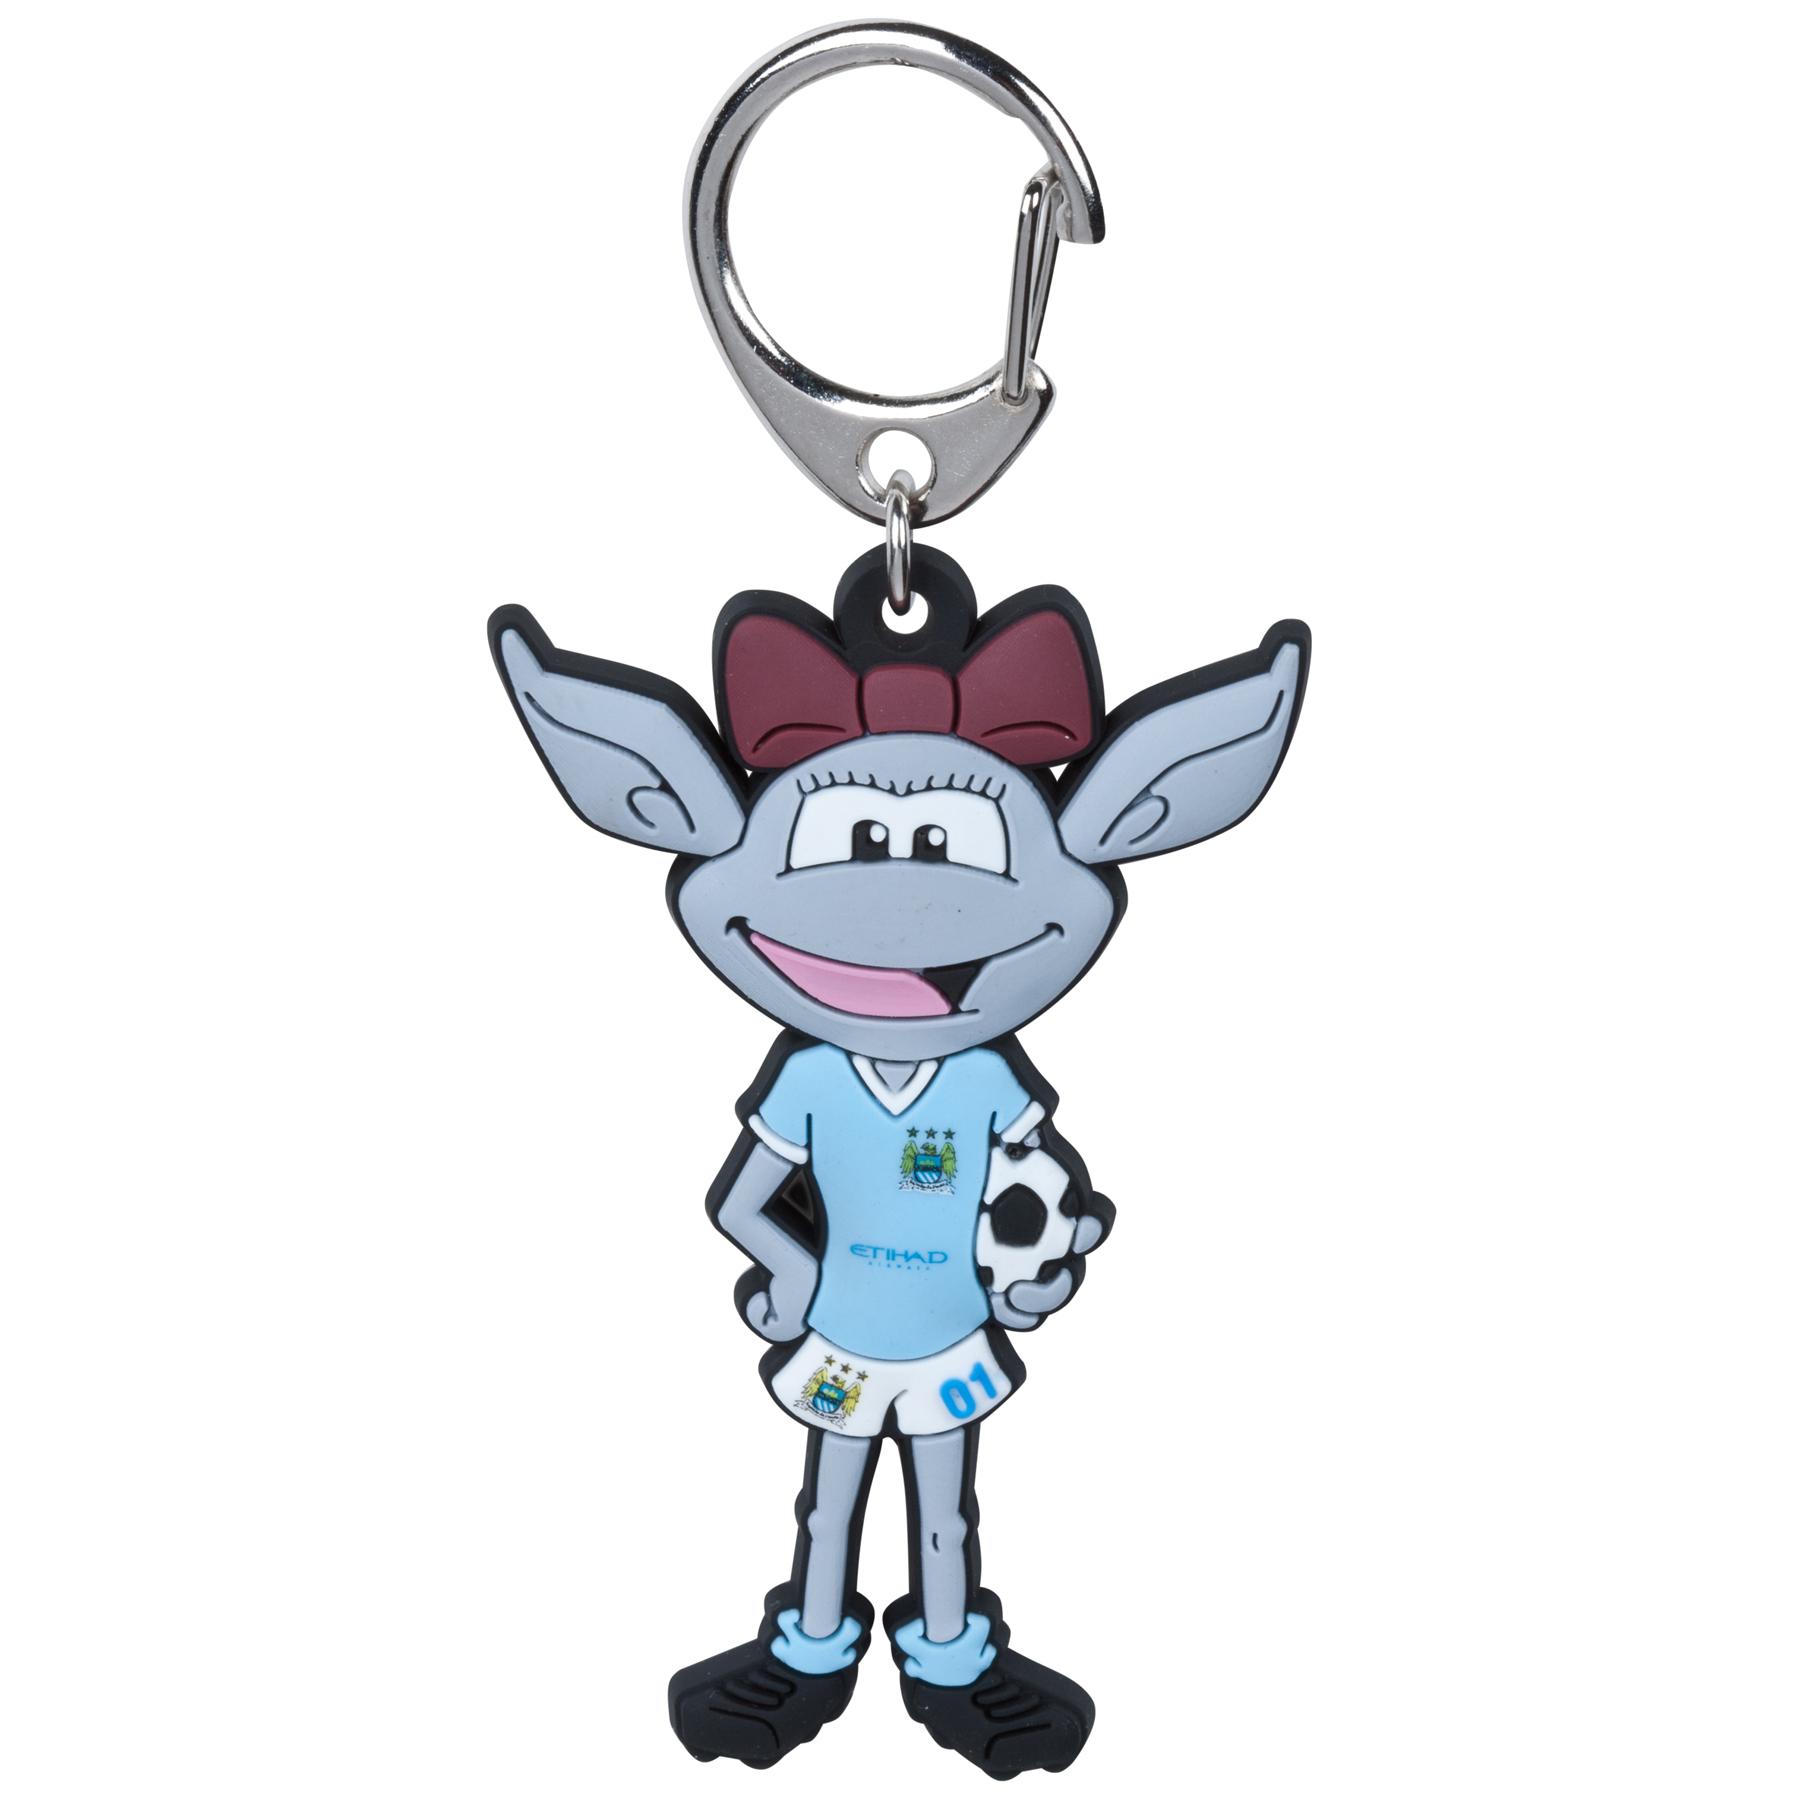 Manchester City Moonbeam Mascot Keyring